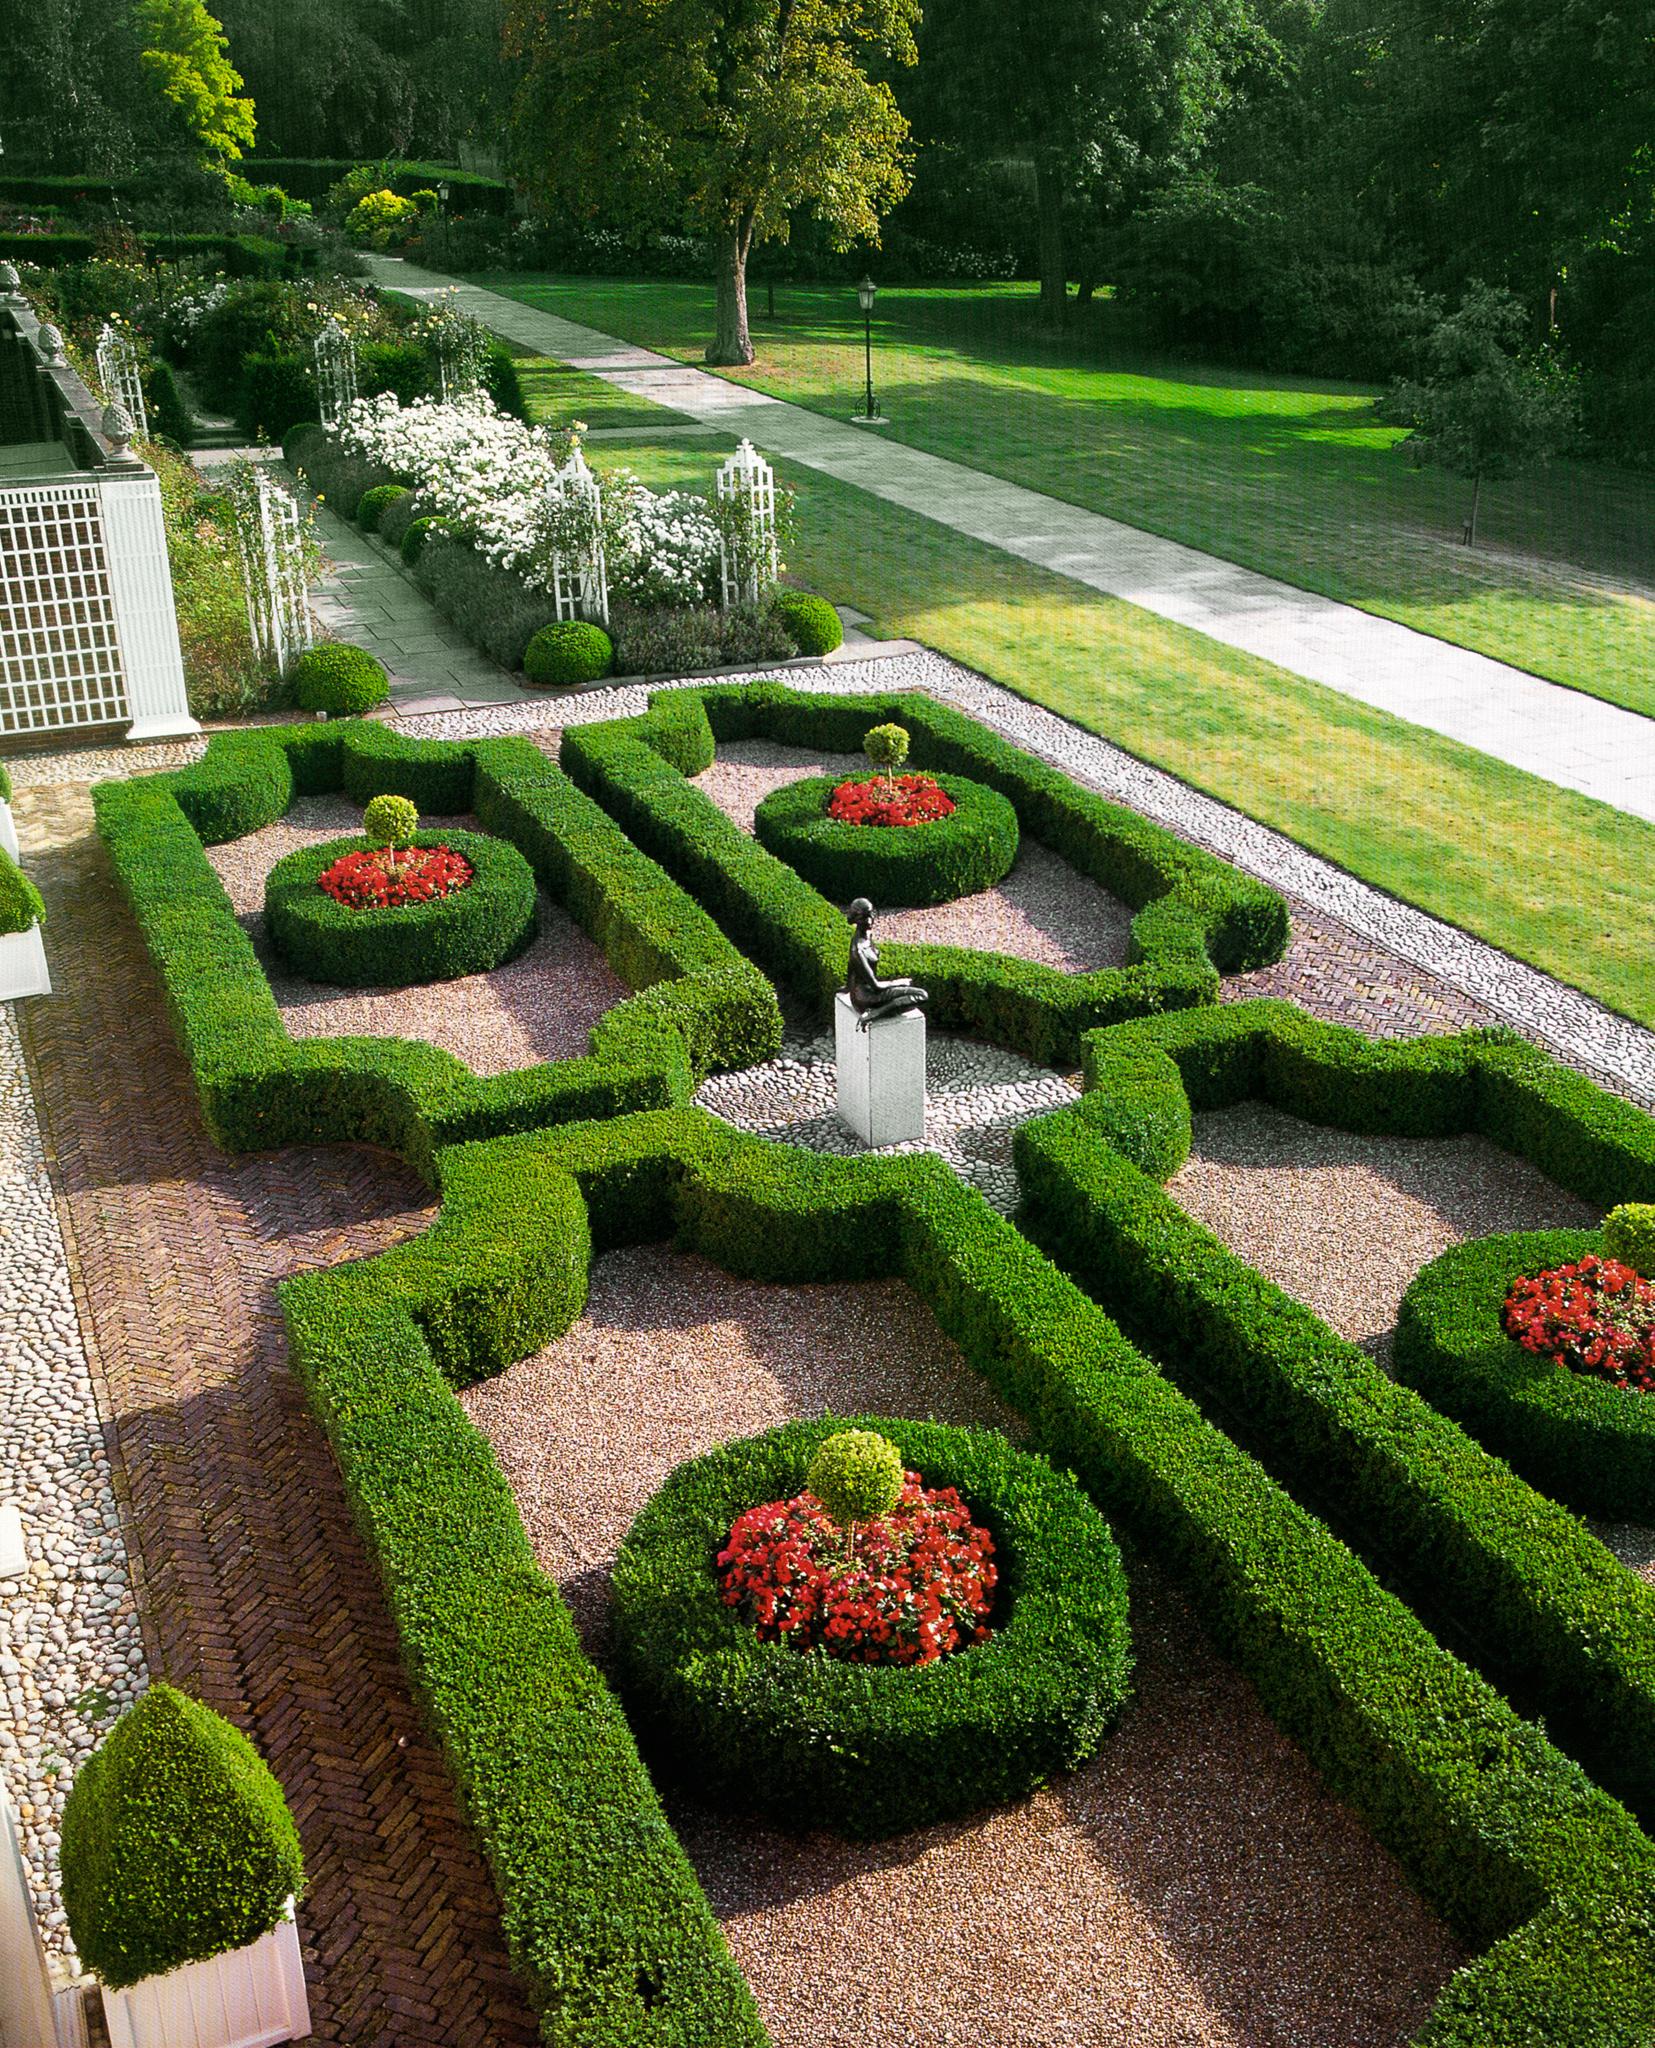 Patung yang dikelilingi pagar tanaman dipangkas dengan pola dekoratif dan jalan setapak (State Dept.)